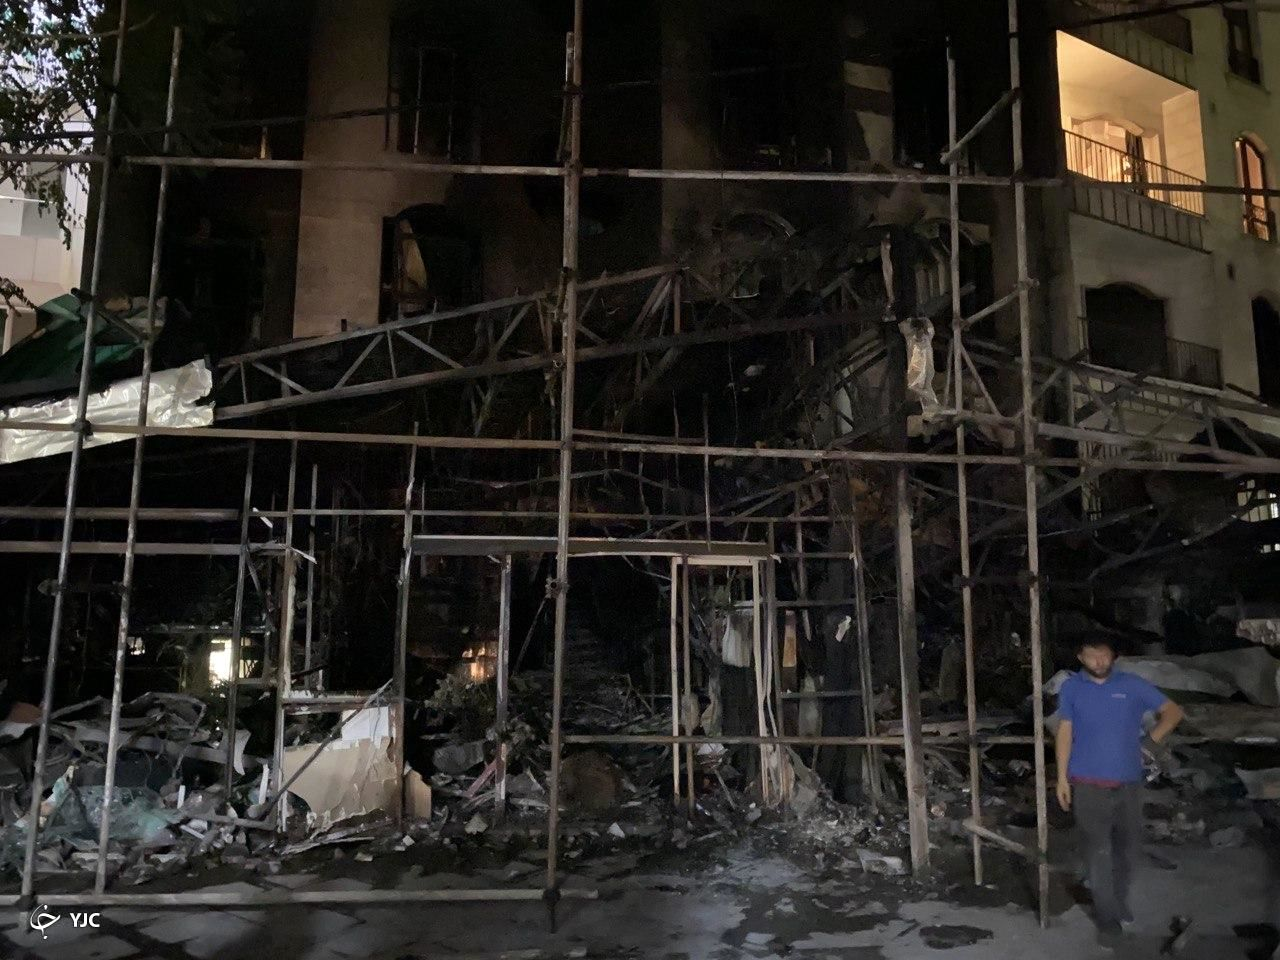 جزئیات حادثه انفجار در کلینیک سینا + تصاویر